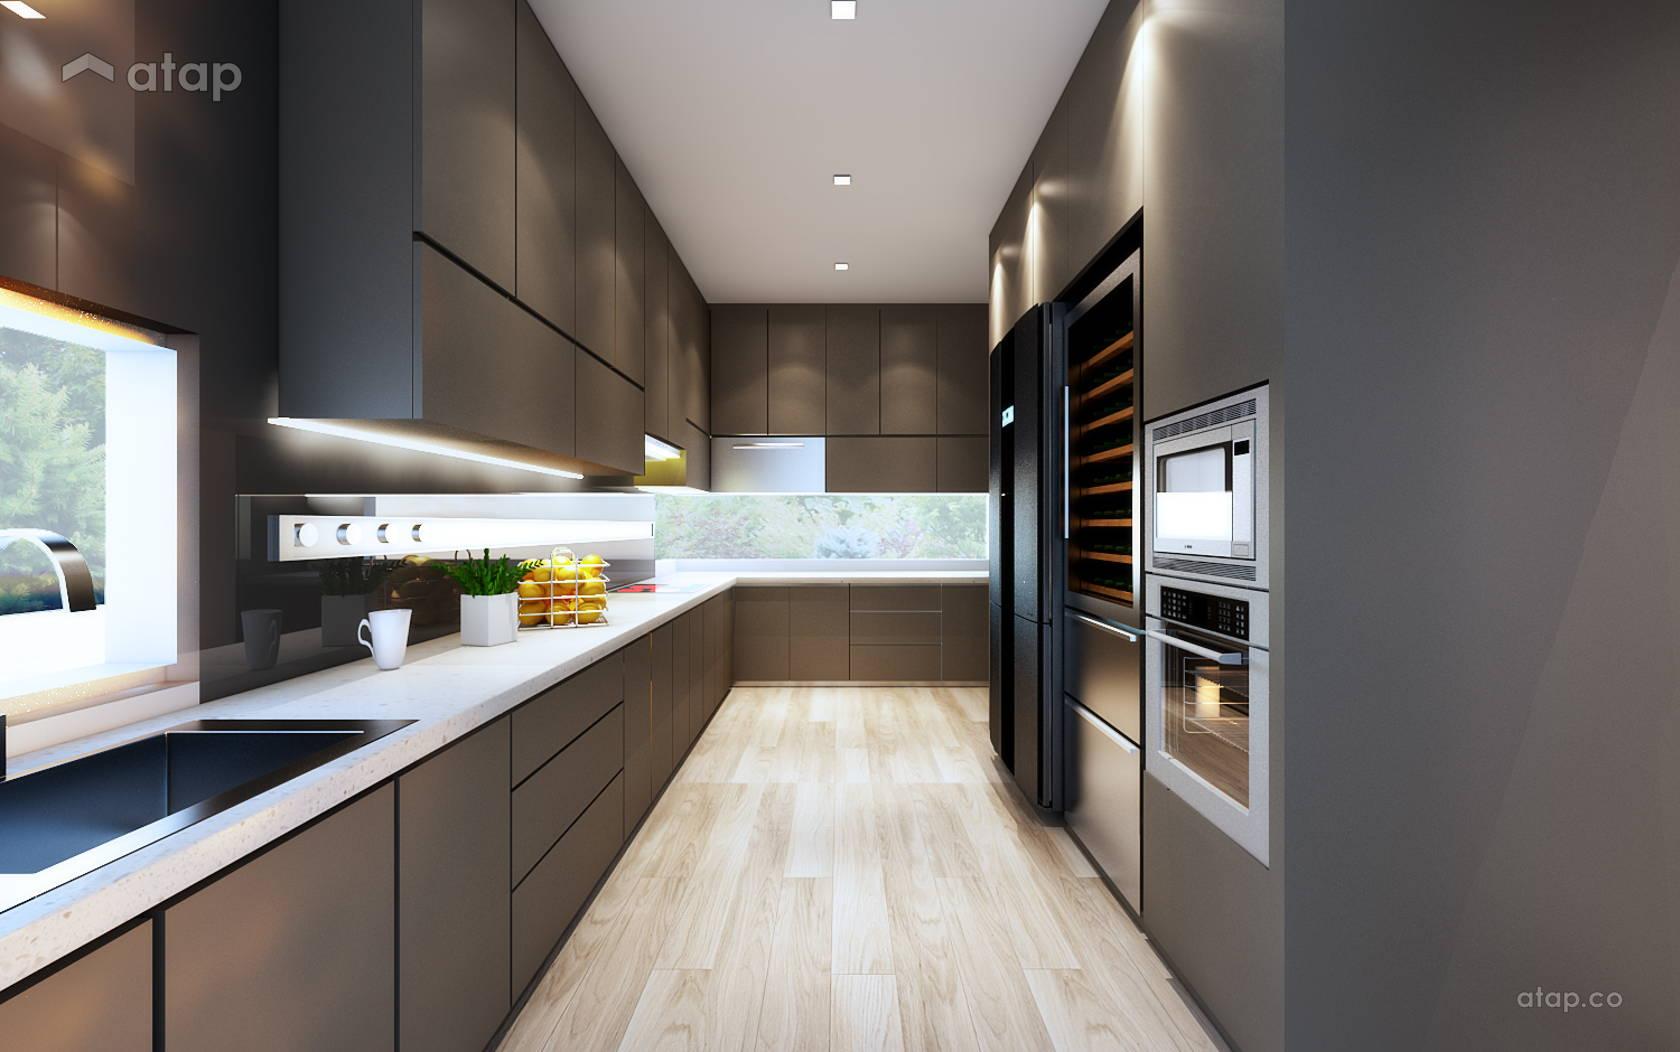 Segar Perdana Bungalow House Interior Design Renovation Ideas ...